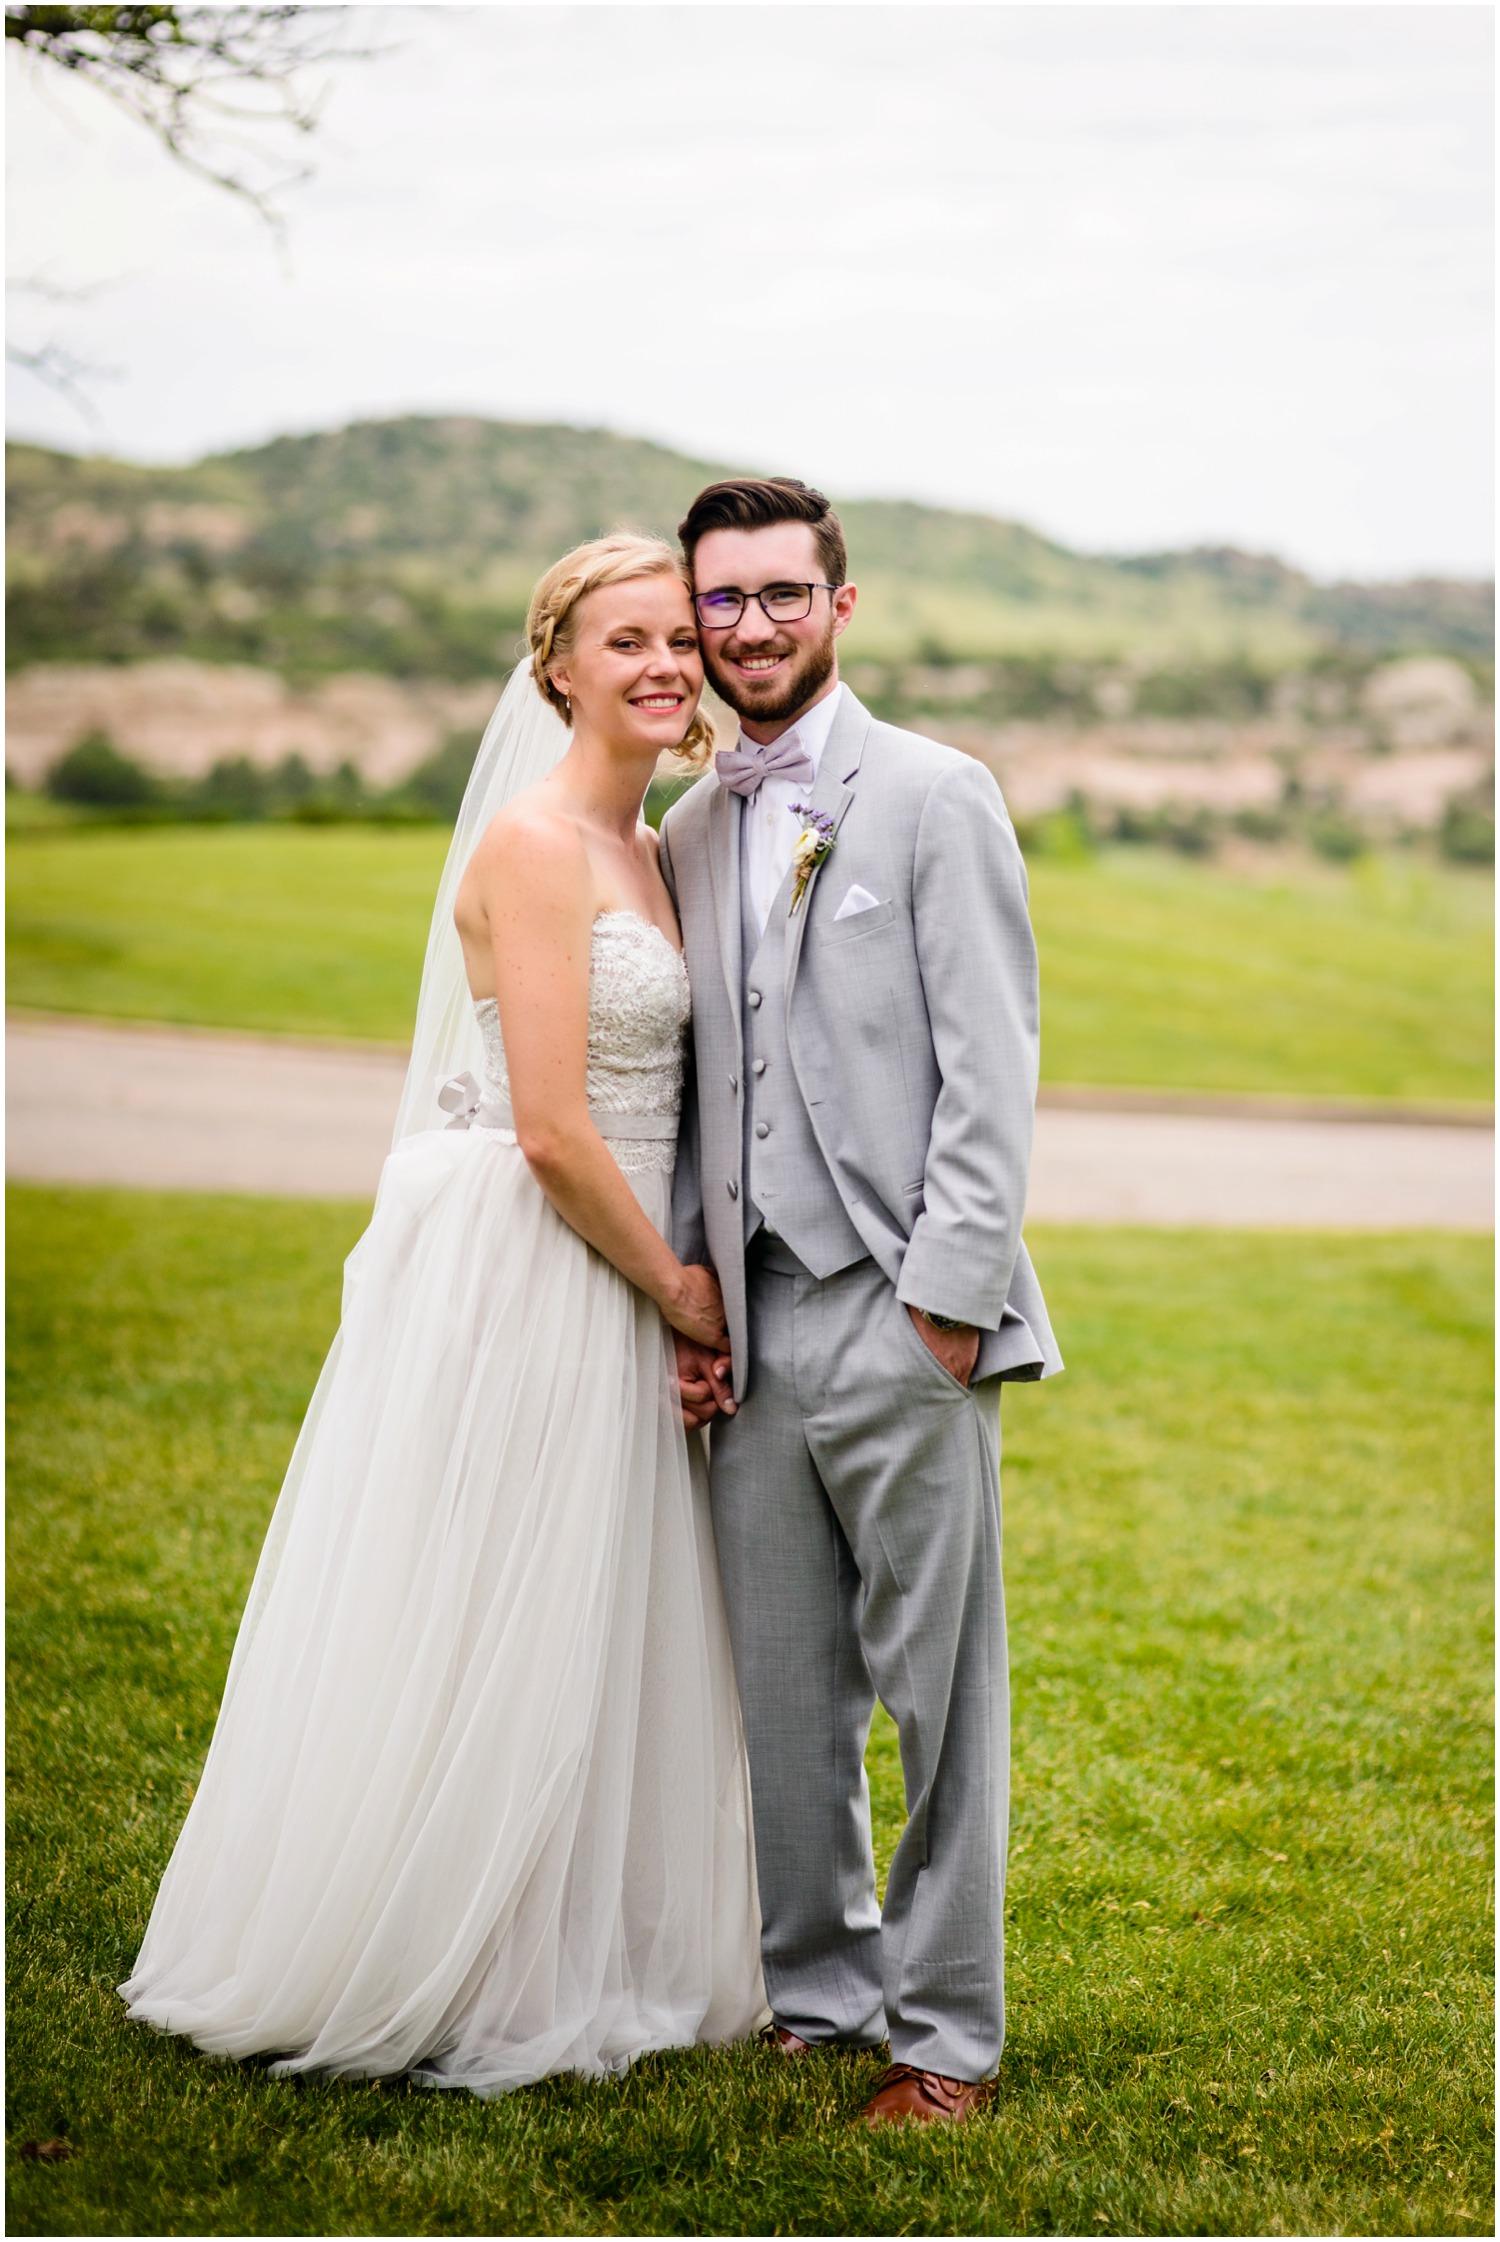 Manor-House-Colorado-Summer-Wedding_0145.jpg